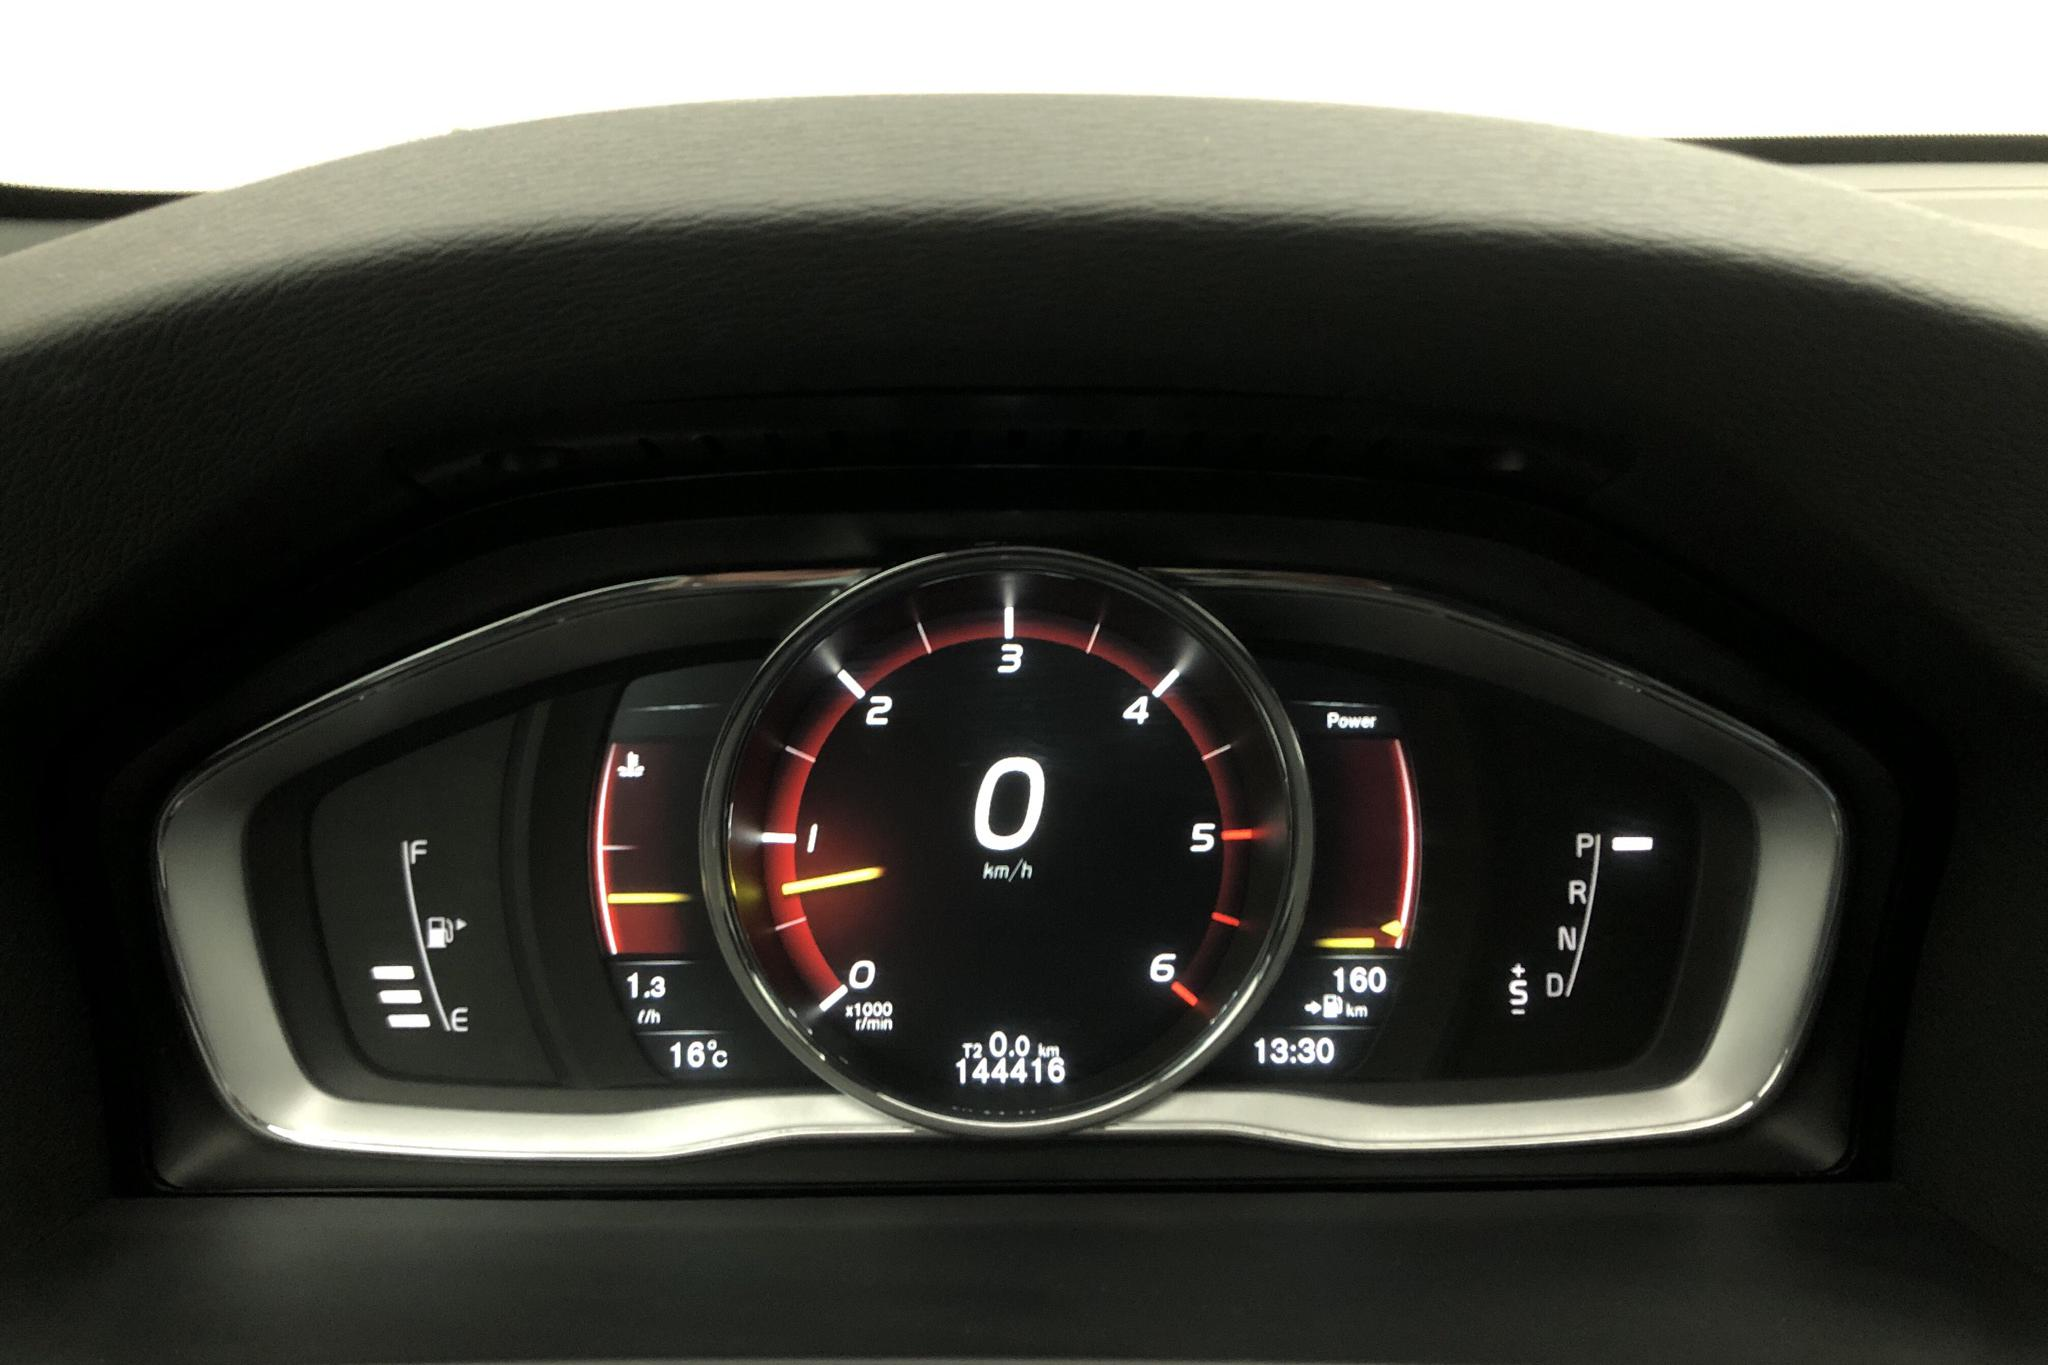 Volvo V60 D4 Cross Country AWD (190hk) - 144 410 km - Automatic - white - 2018